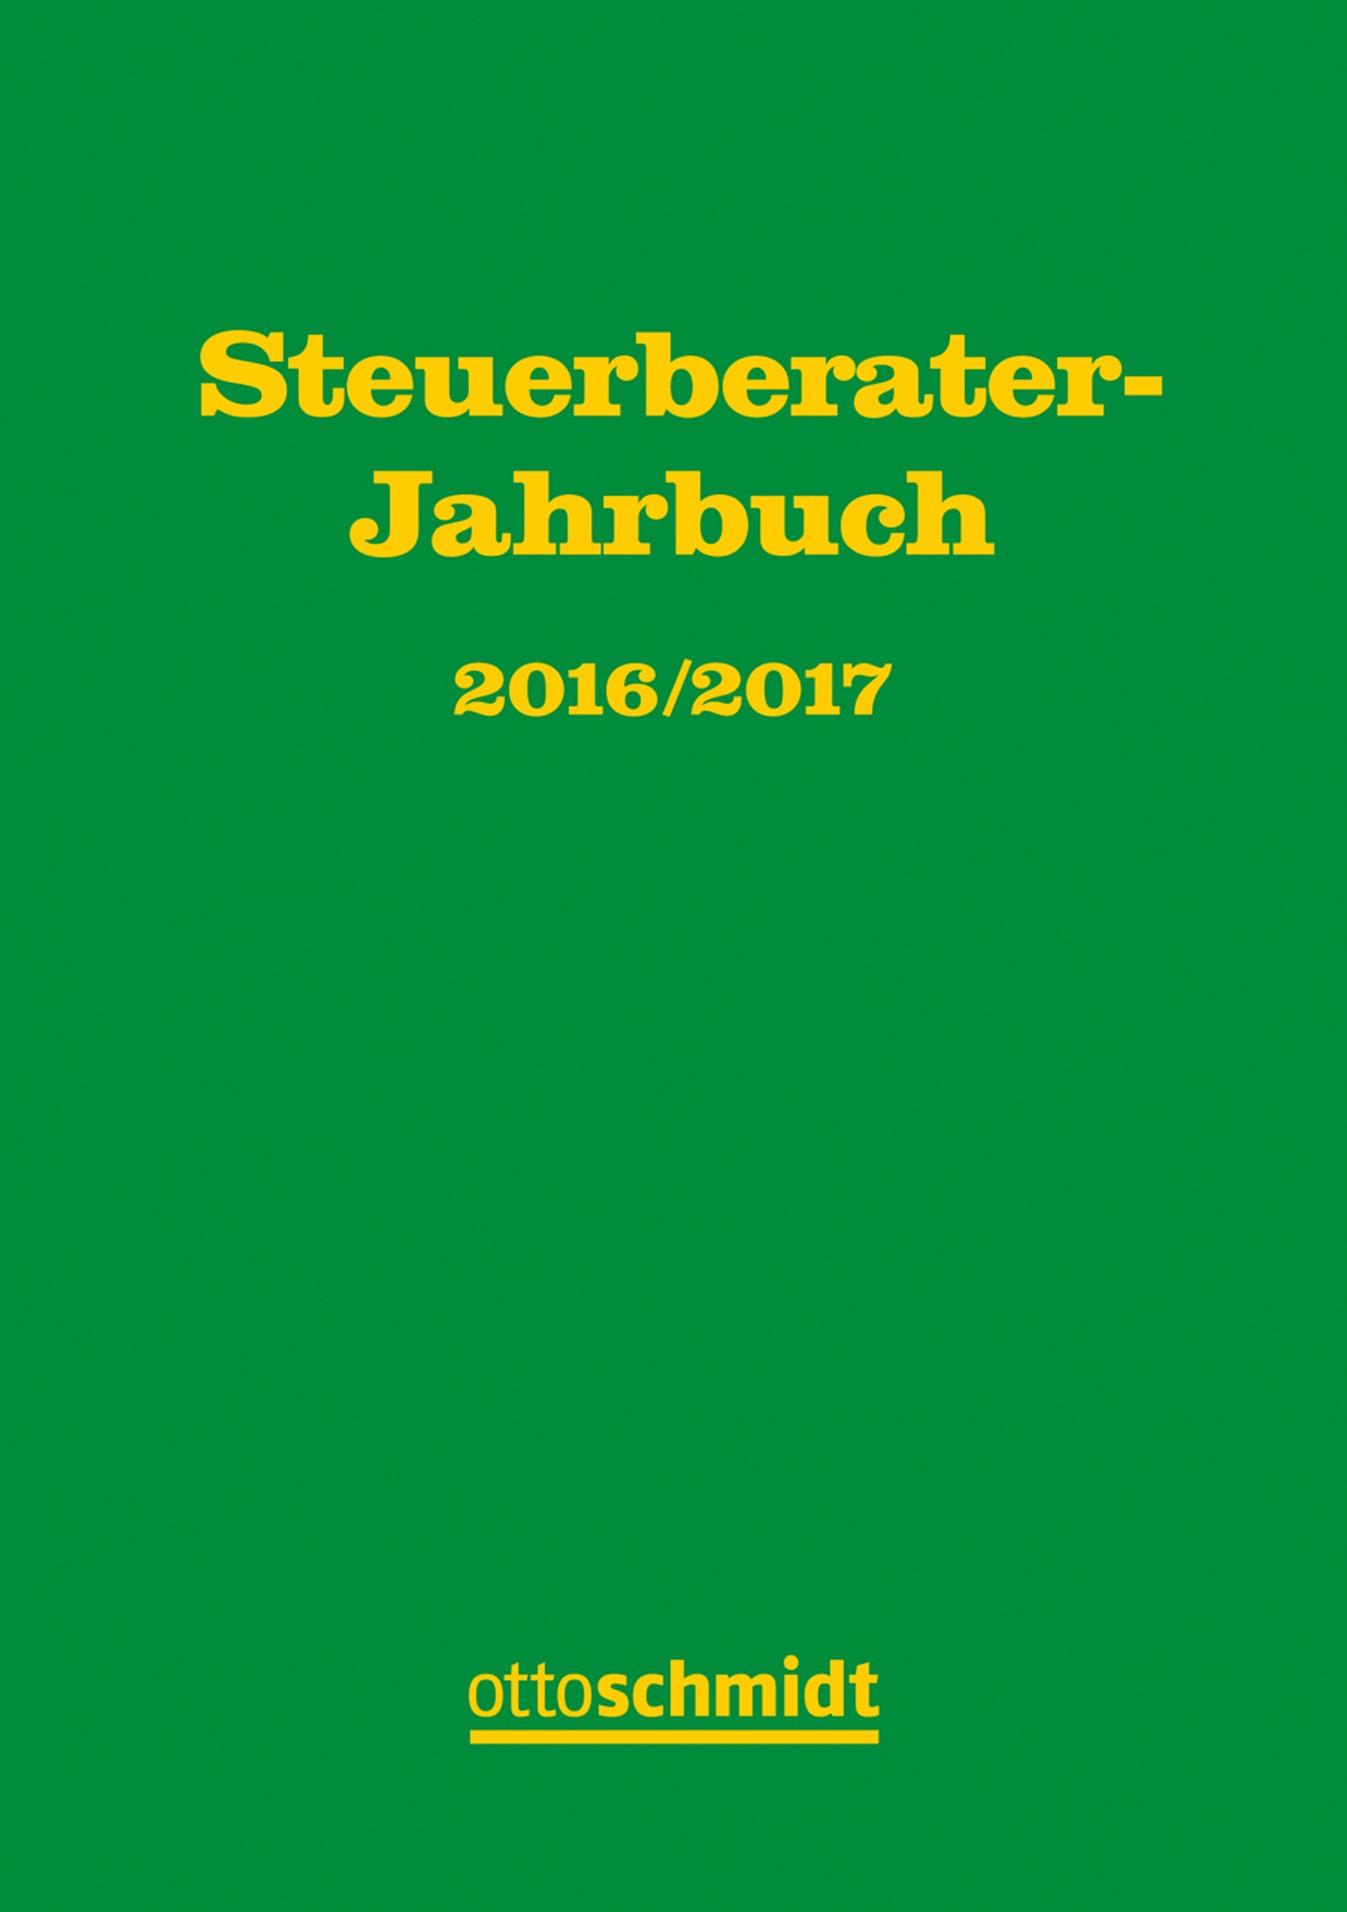 Steuerberater-Jahrbuch 2016/2017 | Fachinstitut der Steuerberater Köln (Hrsg.), 2017 | Buch (Cover)